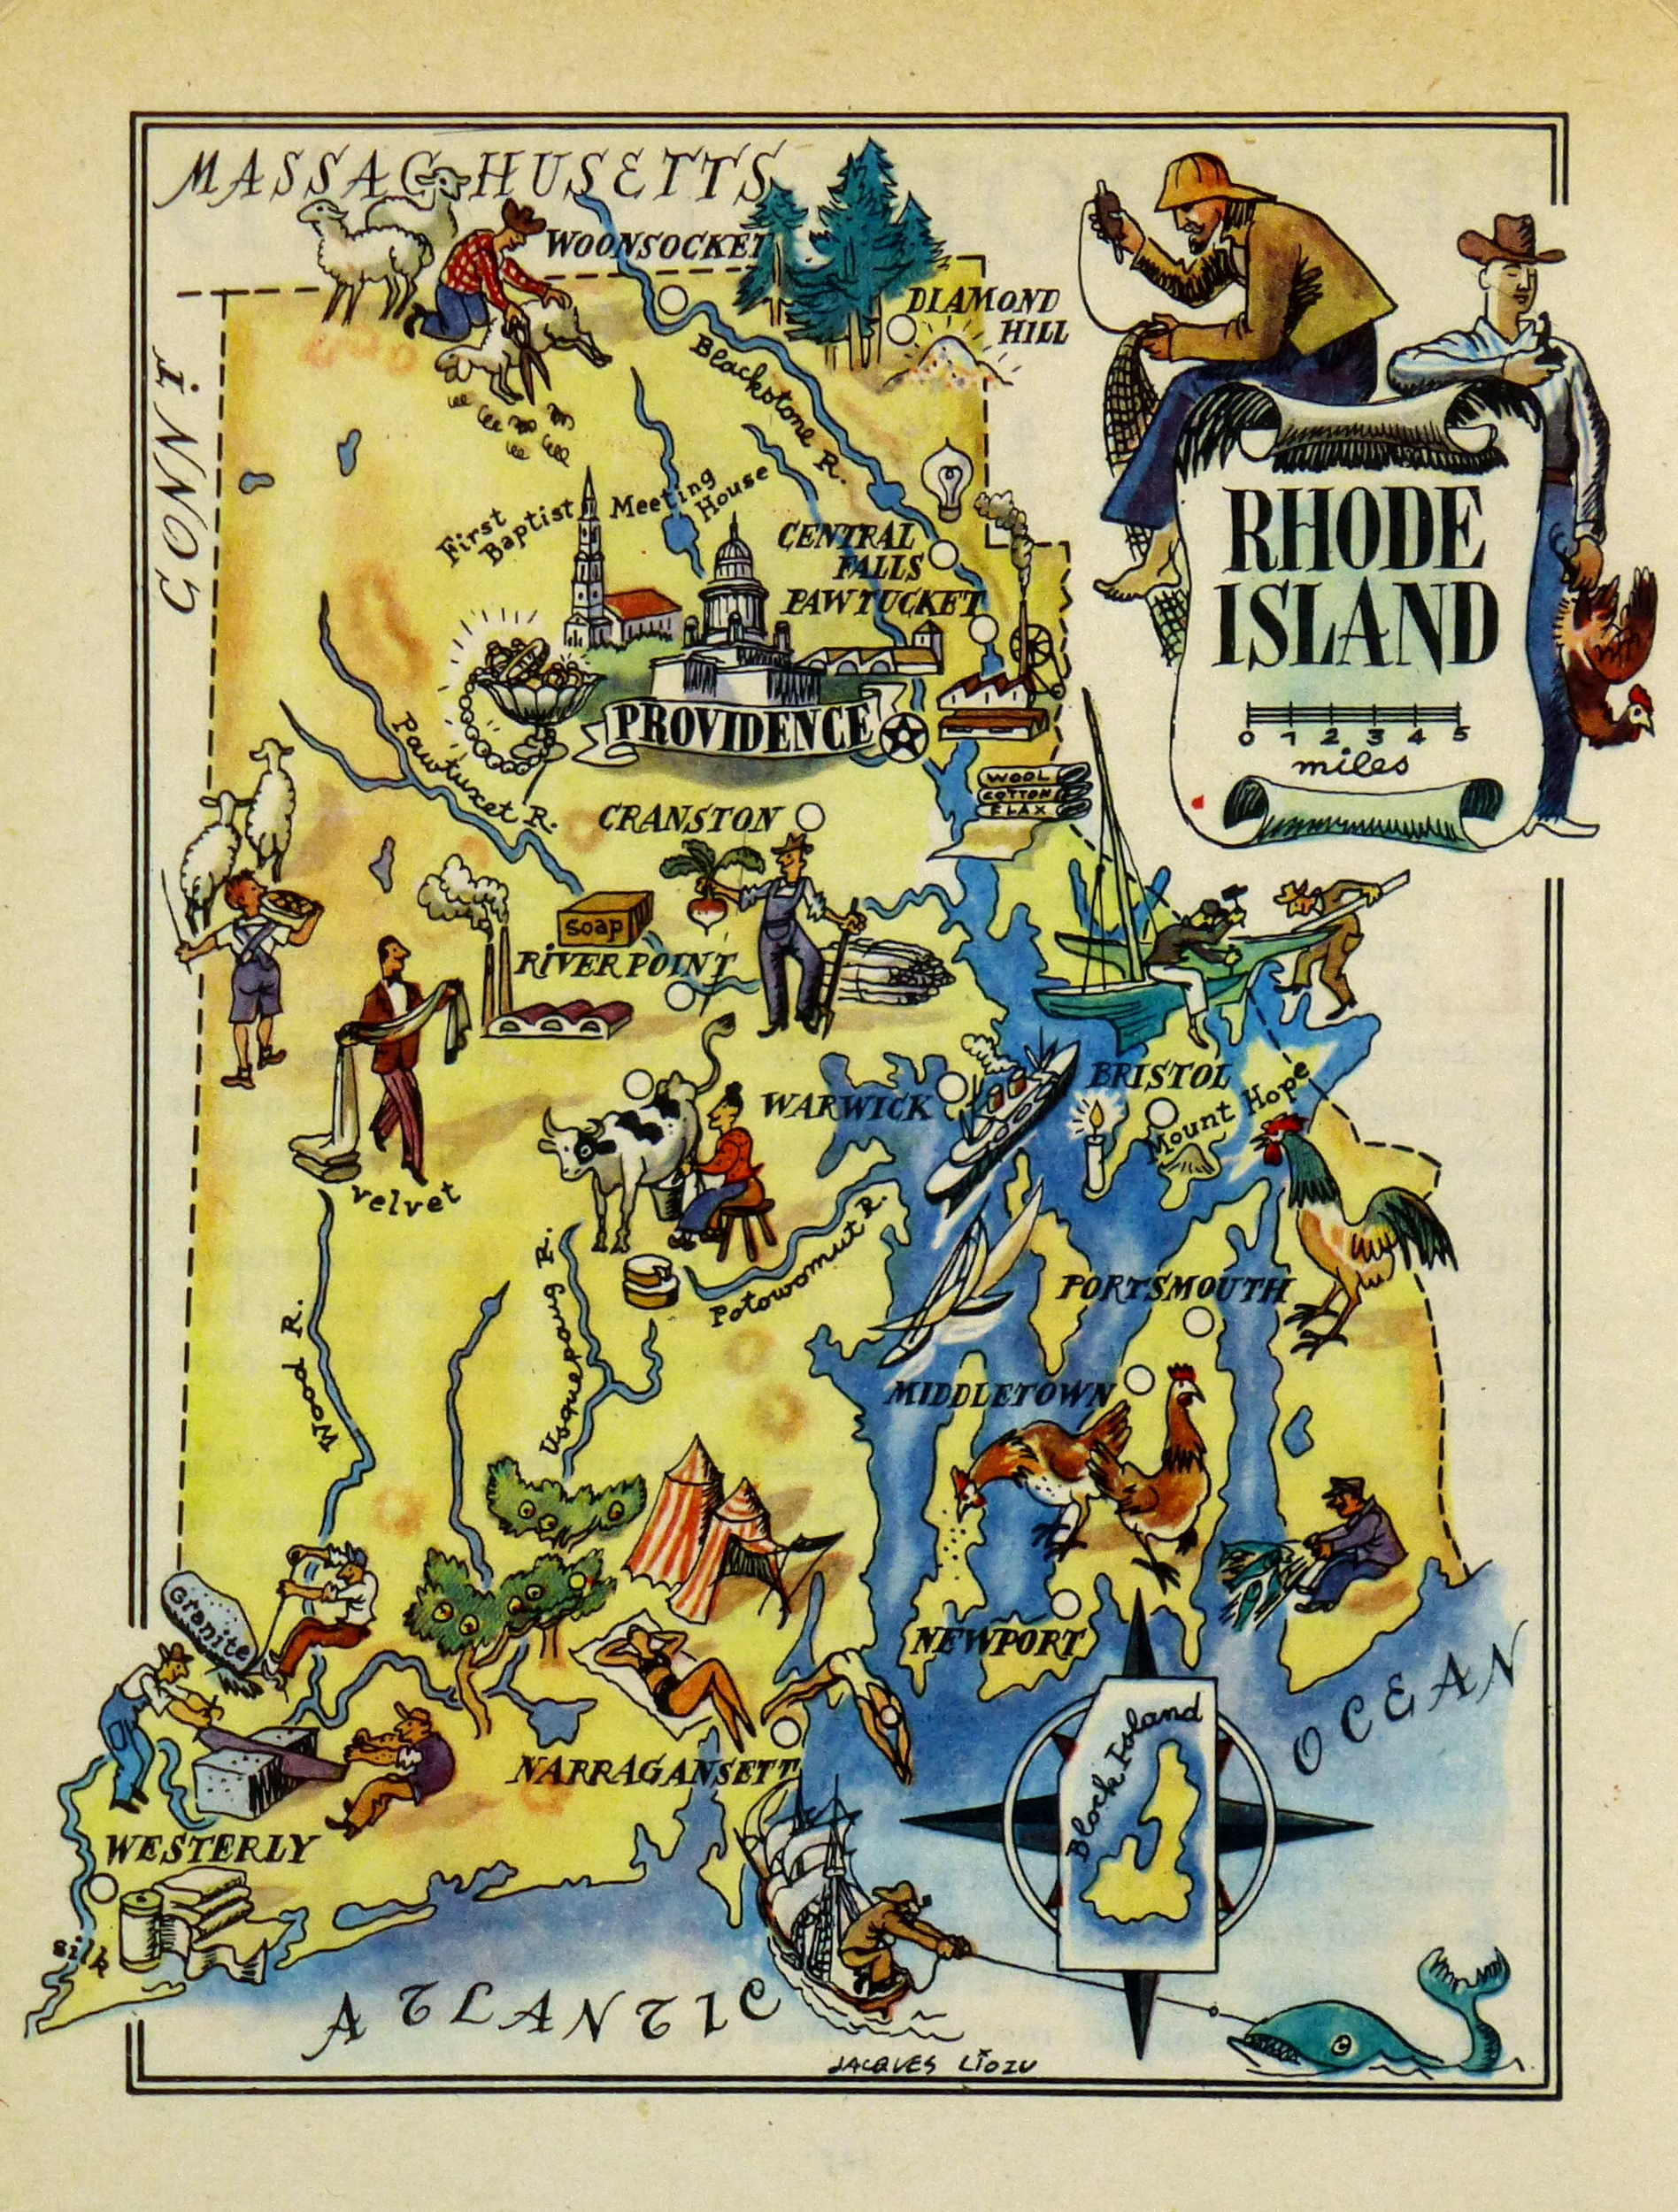 Rhode Island Pictorial Map - Map of rhode island